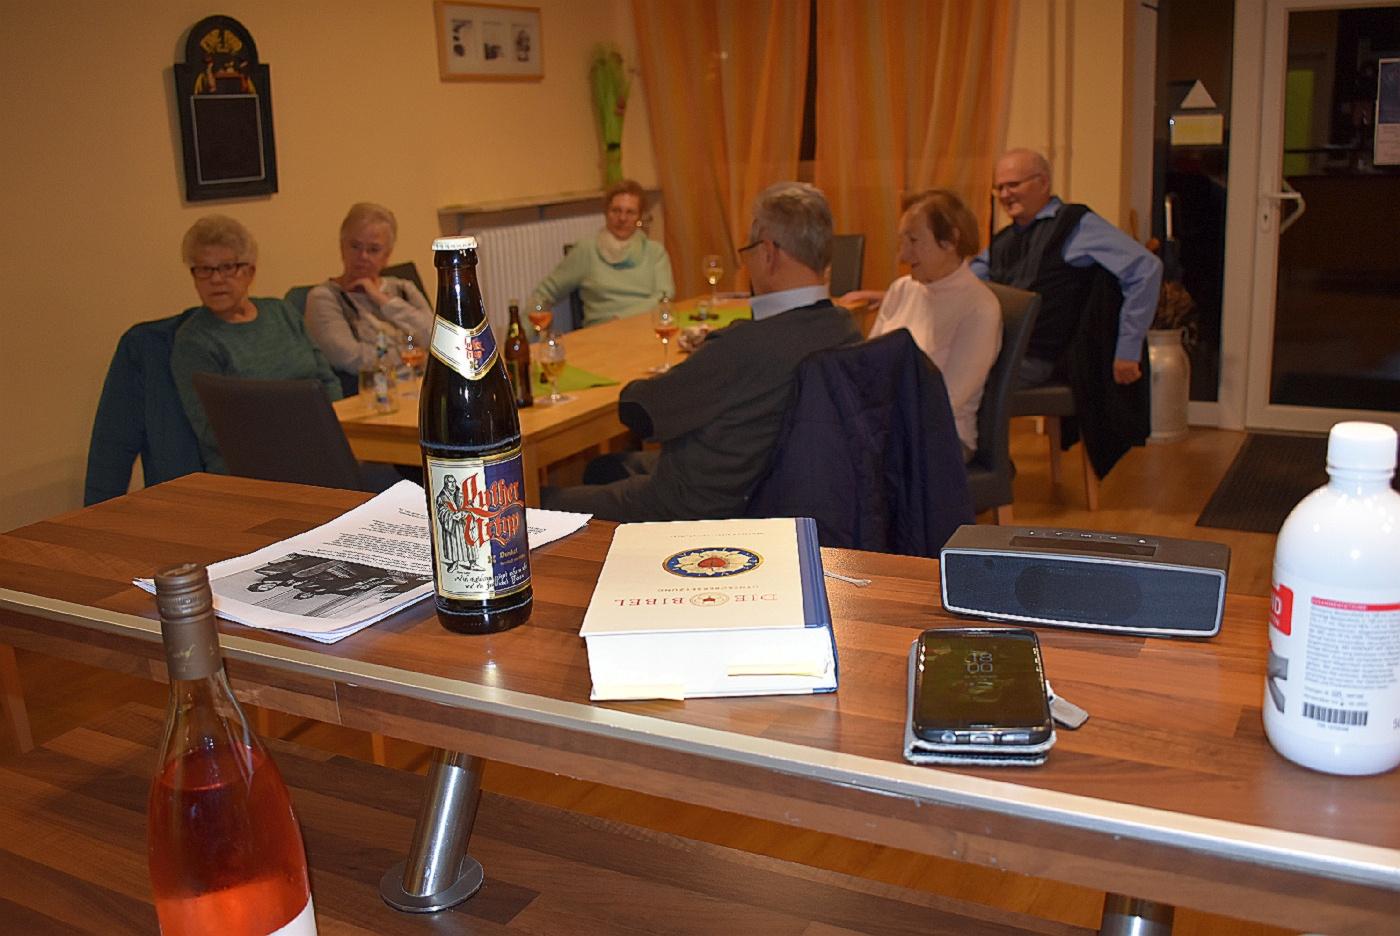 Lutherbier und Bibel (Foto: U. Schmidt)